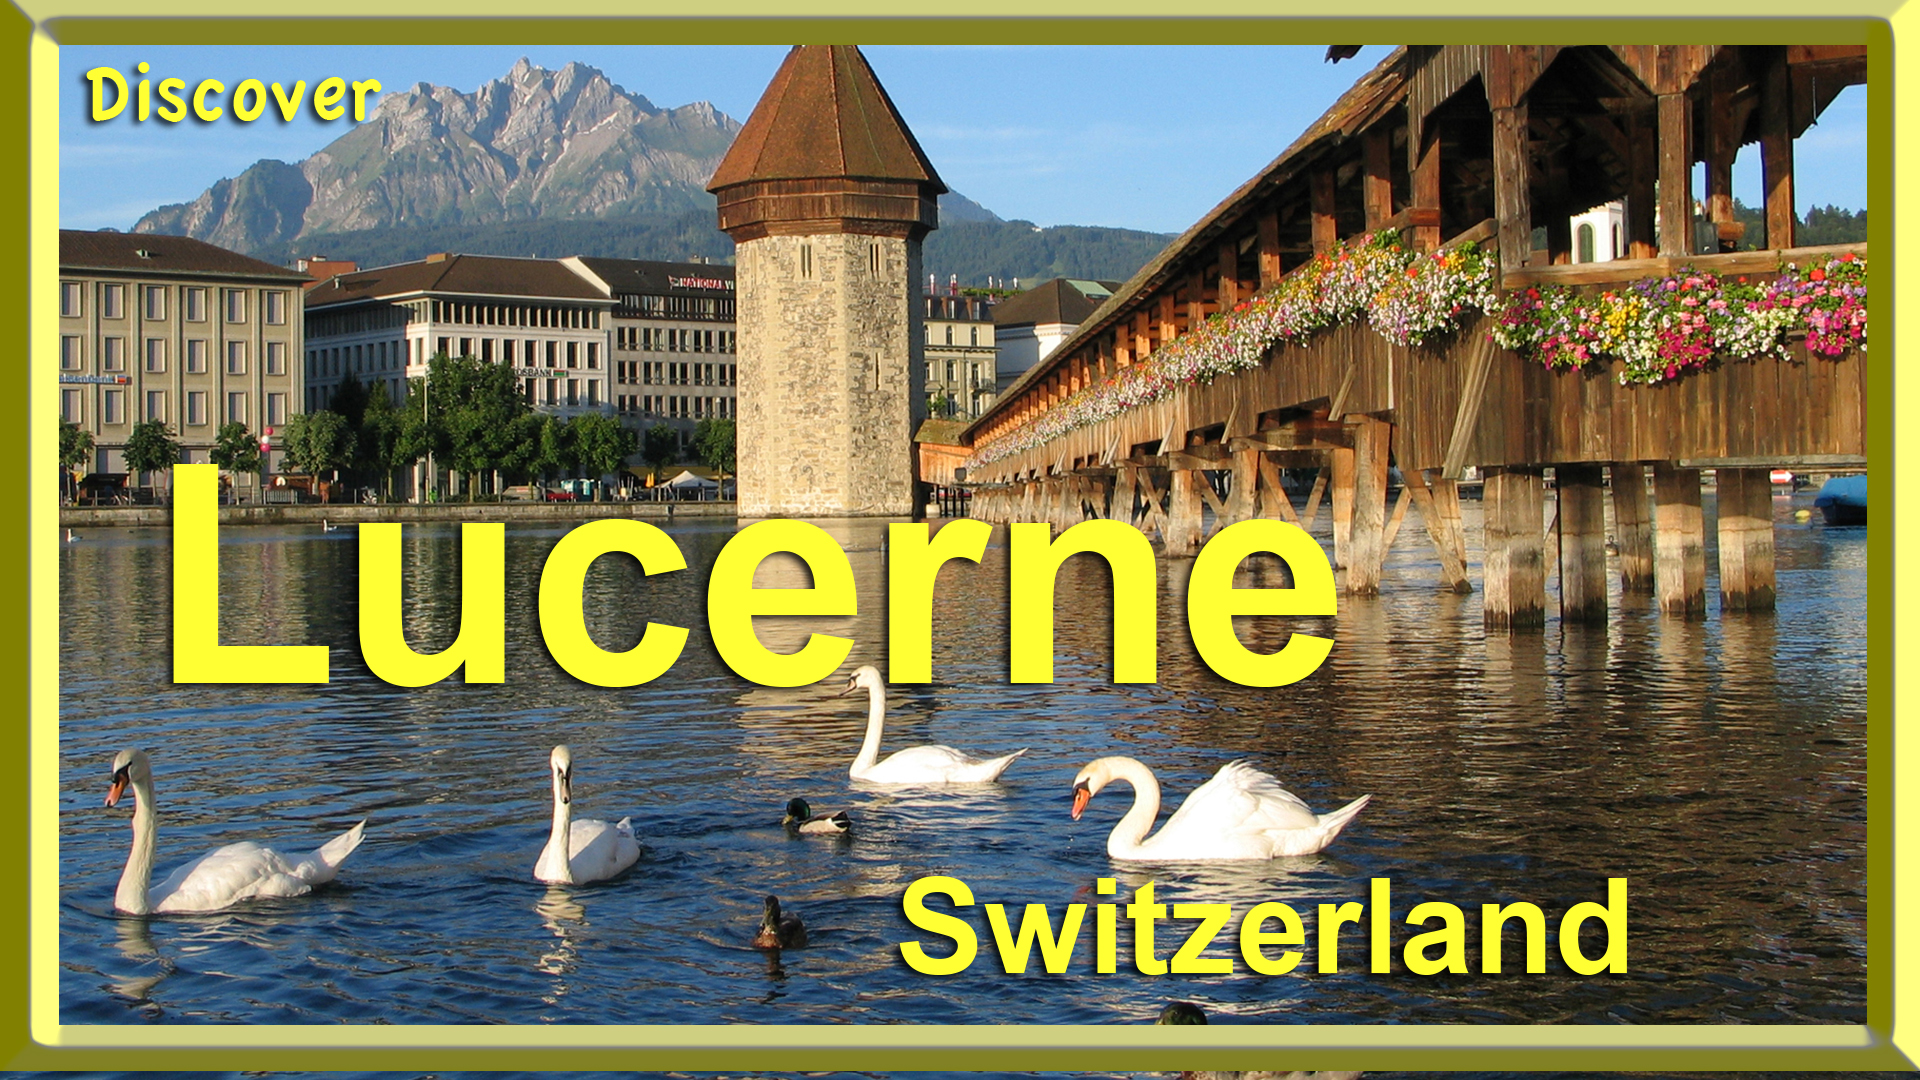 Discover Lucerne Switzerland